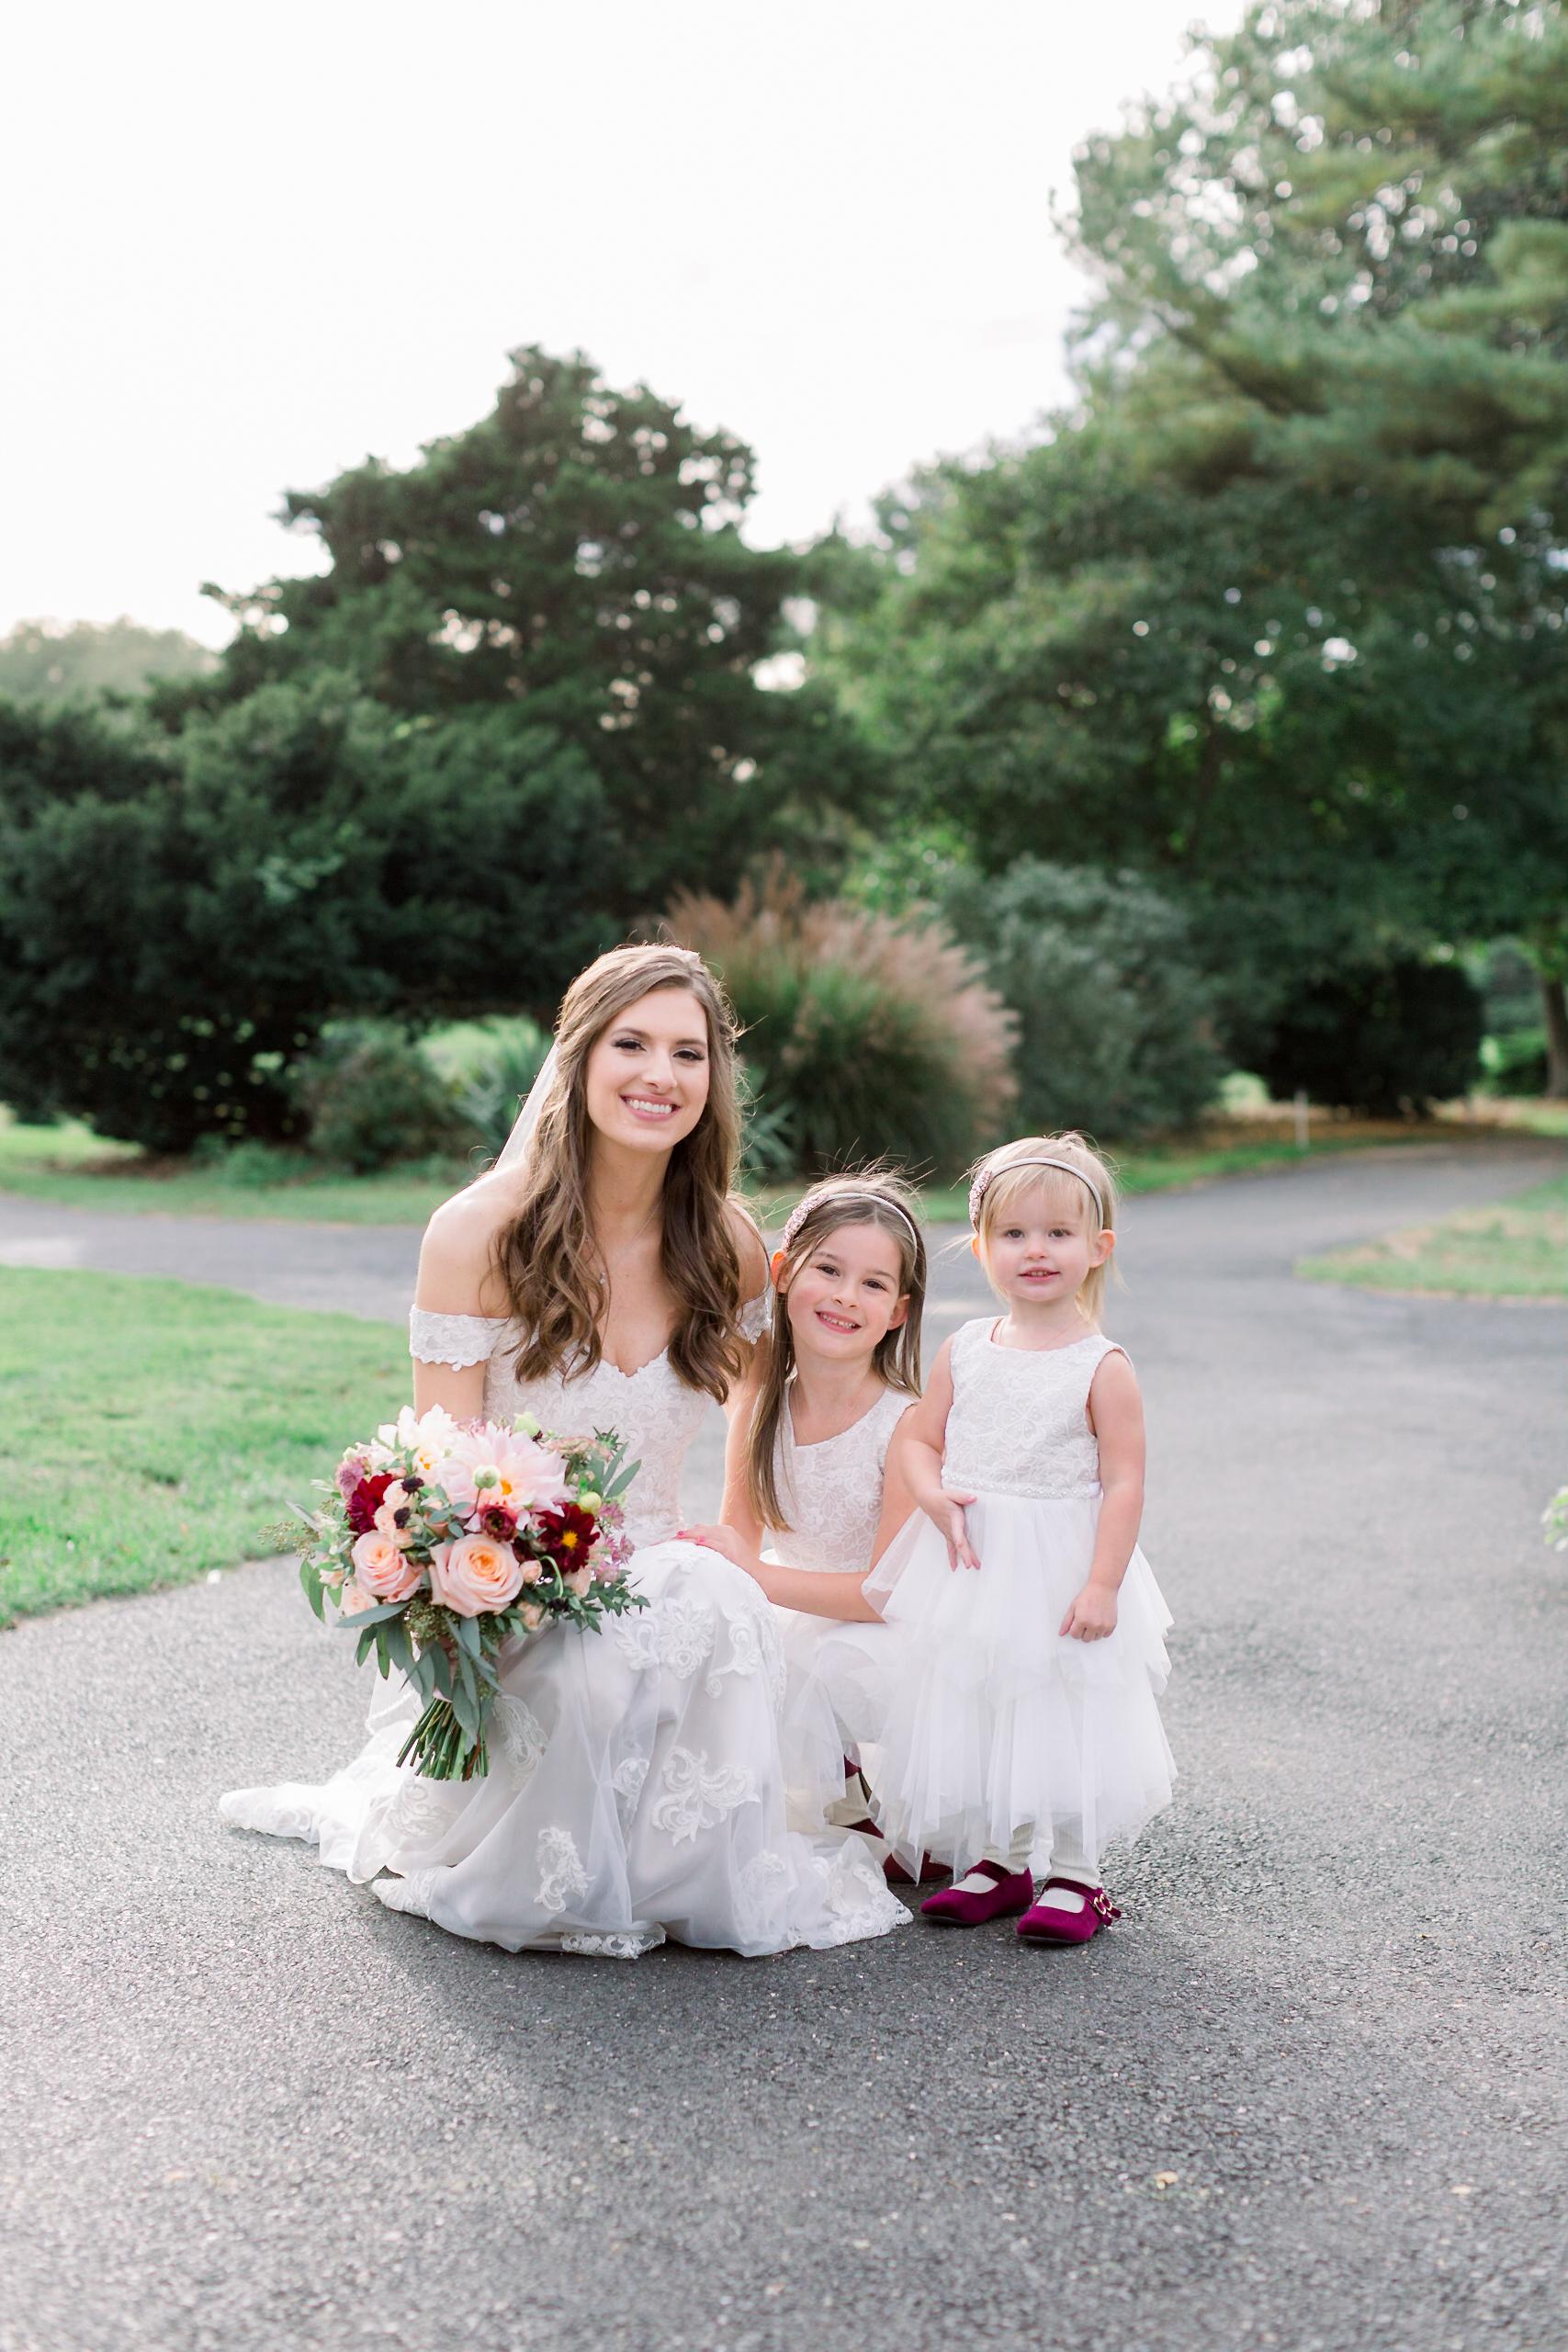 Jenna + Wyatt- 2018 Wedding- Grove Photography-475.jpg